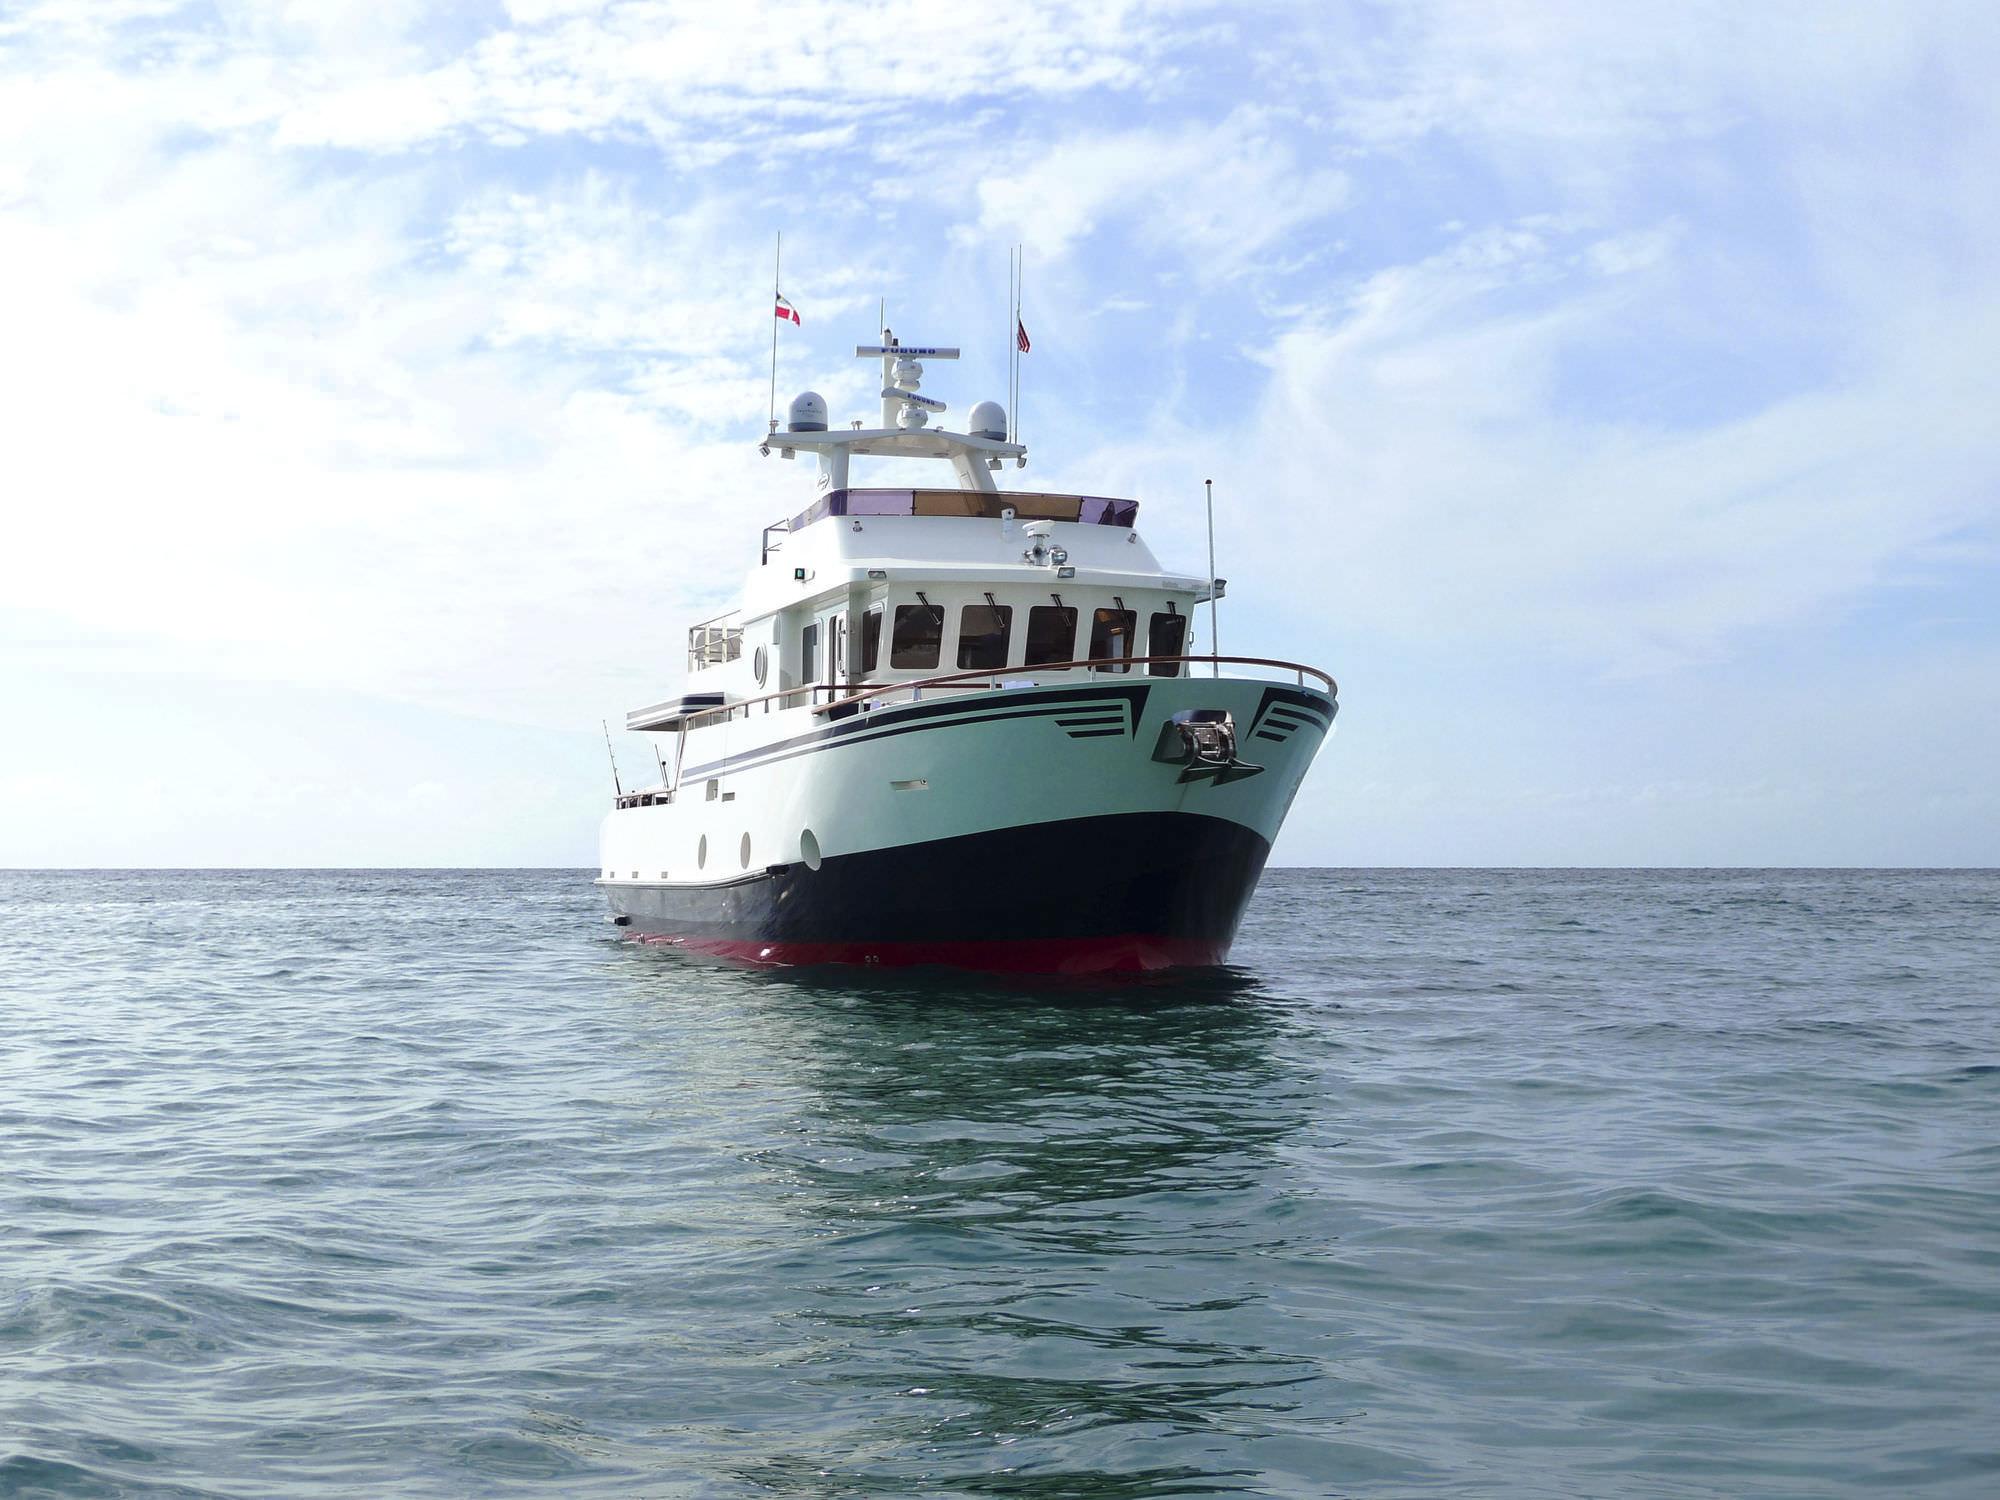 Cruising motor yacht / trawler / flybridge / steel - B 55 - Bering